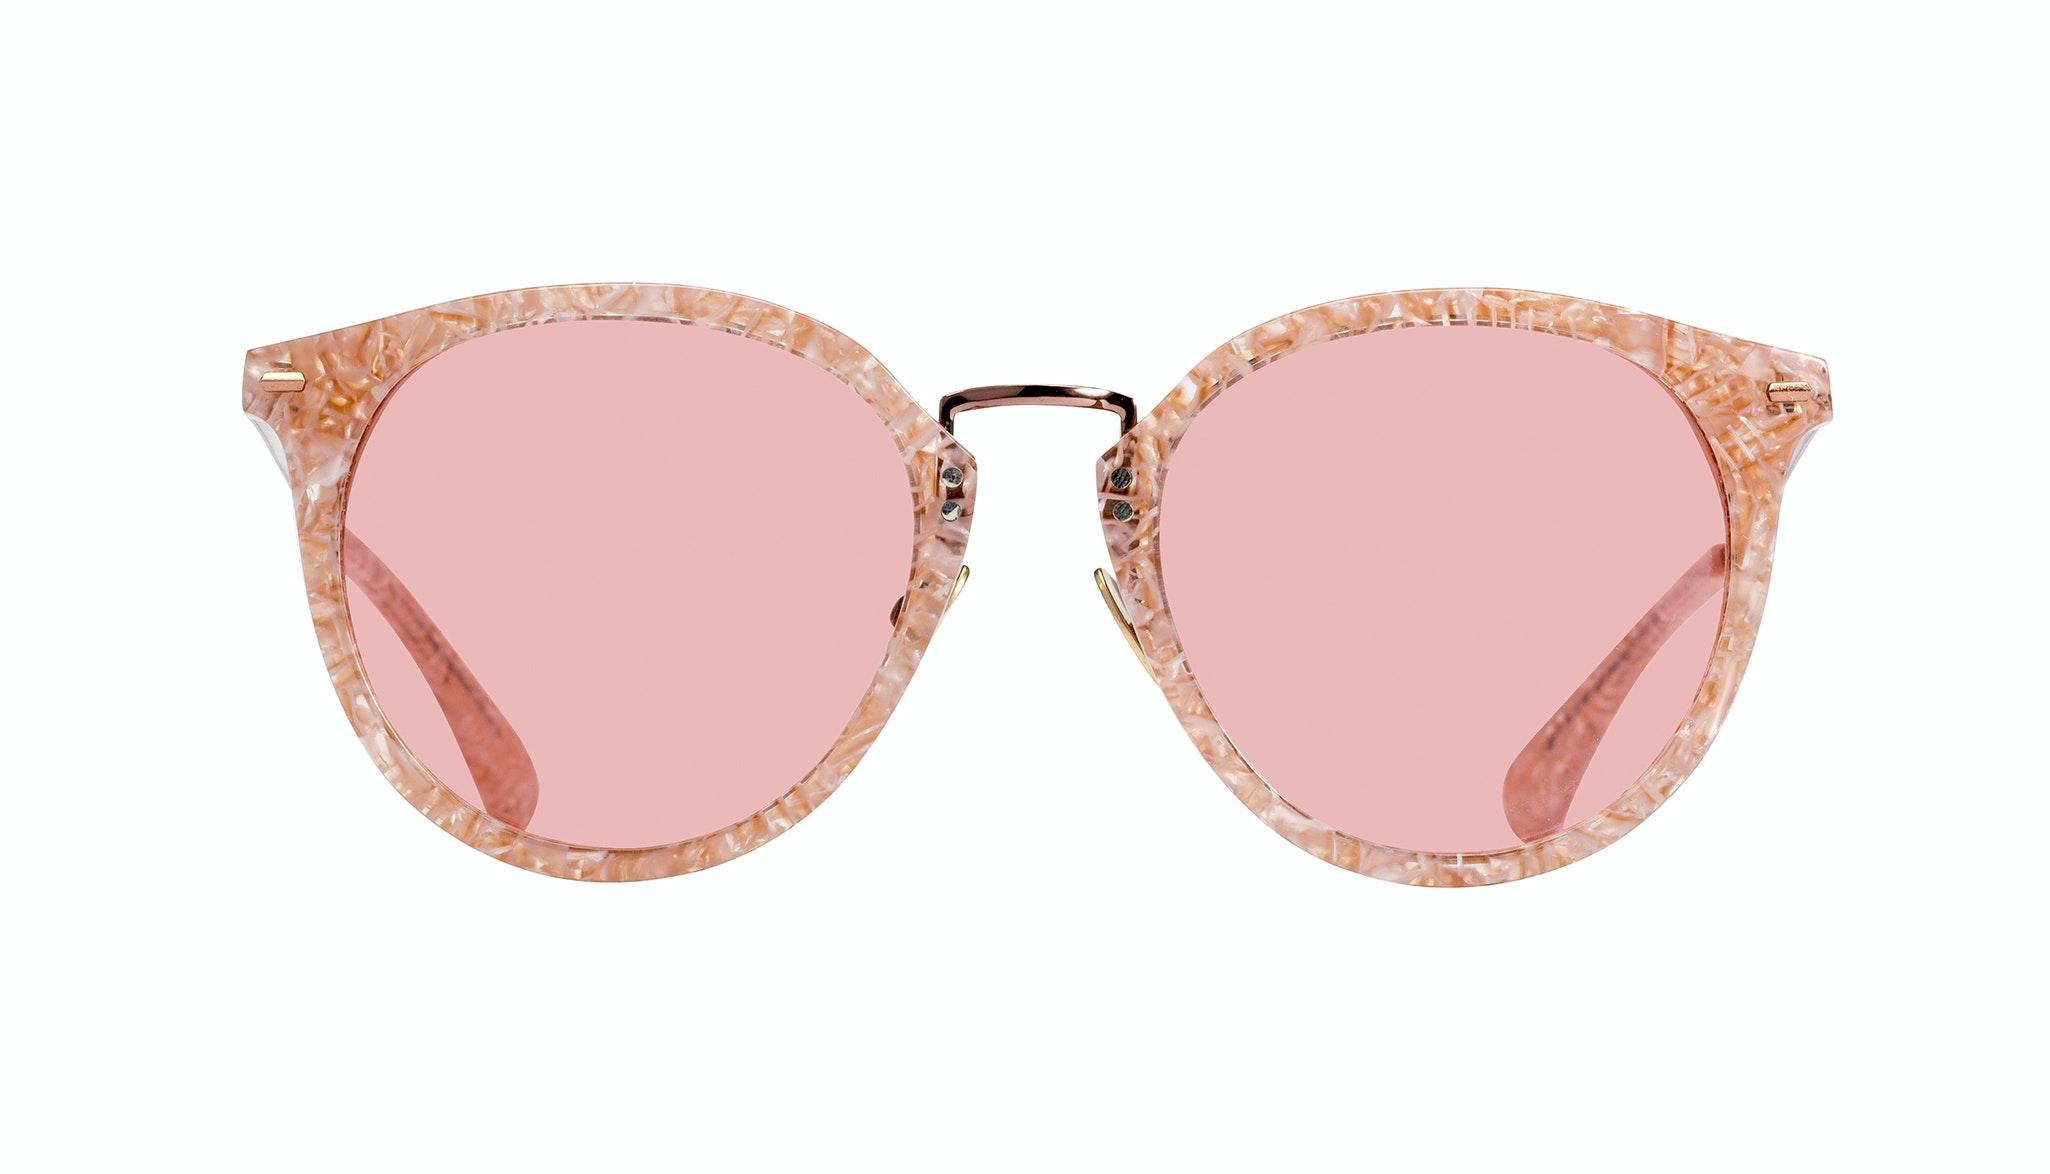 Affordable Fashion Glasses Round Sunglasses Women Poppy Provence